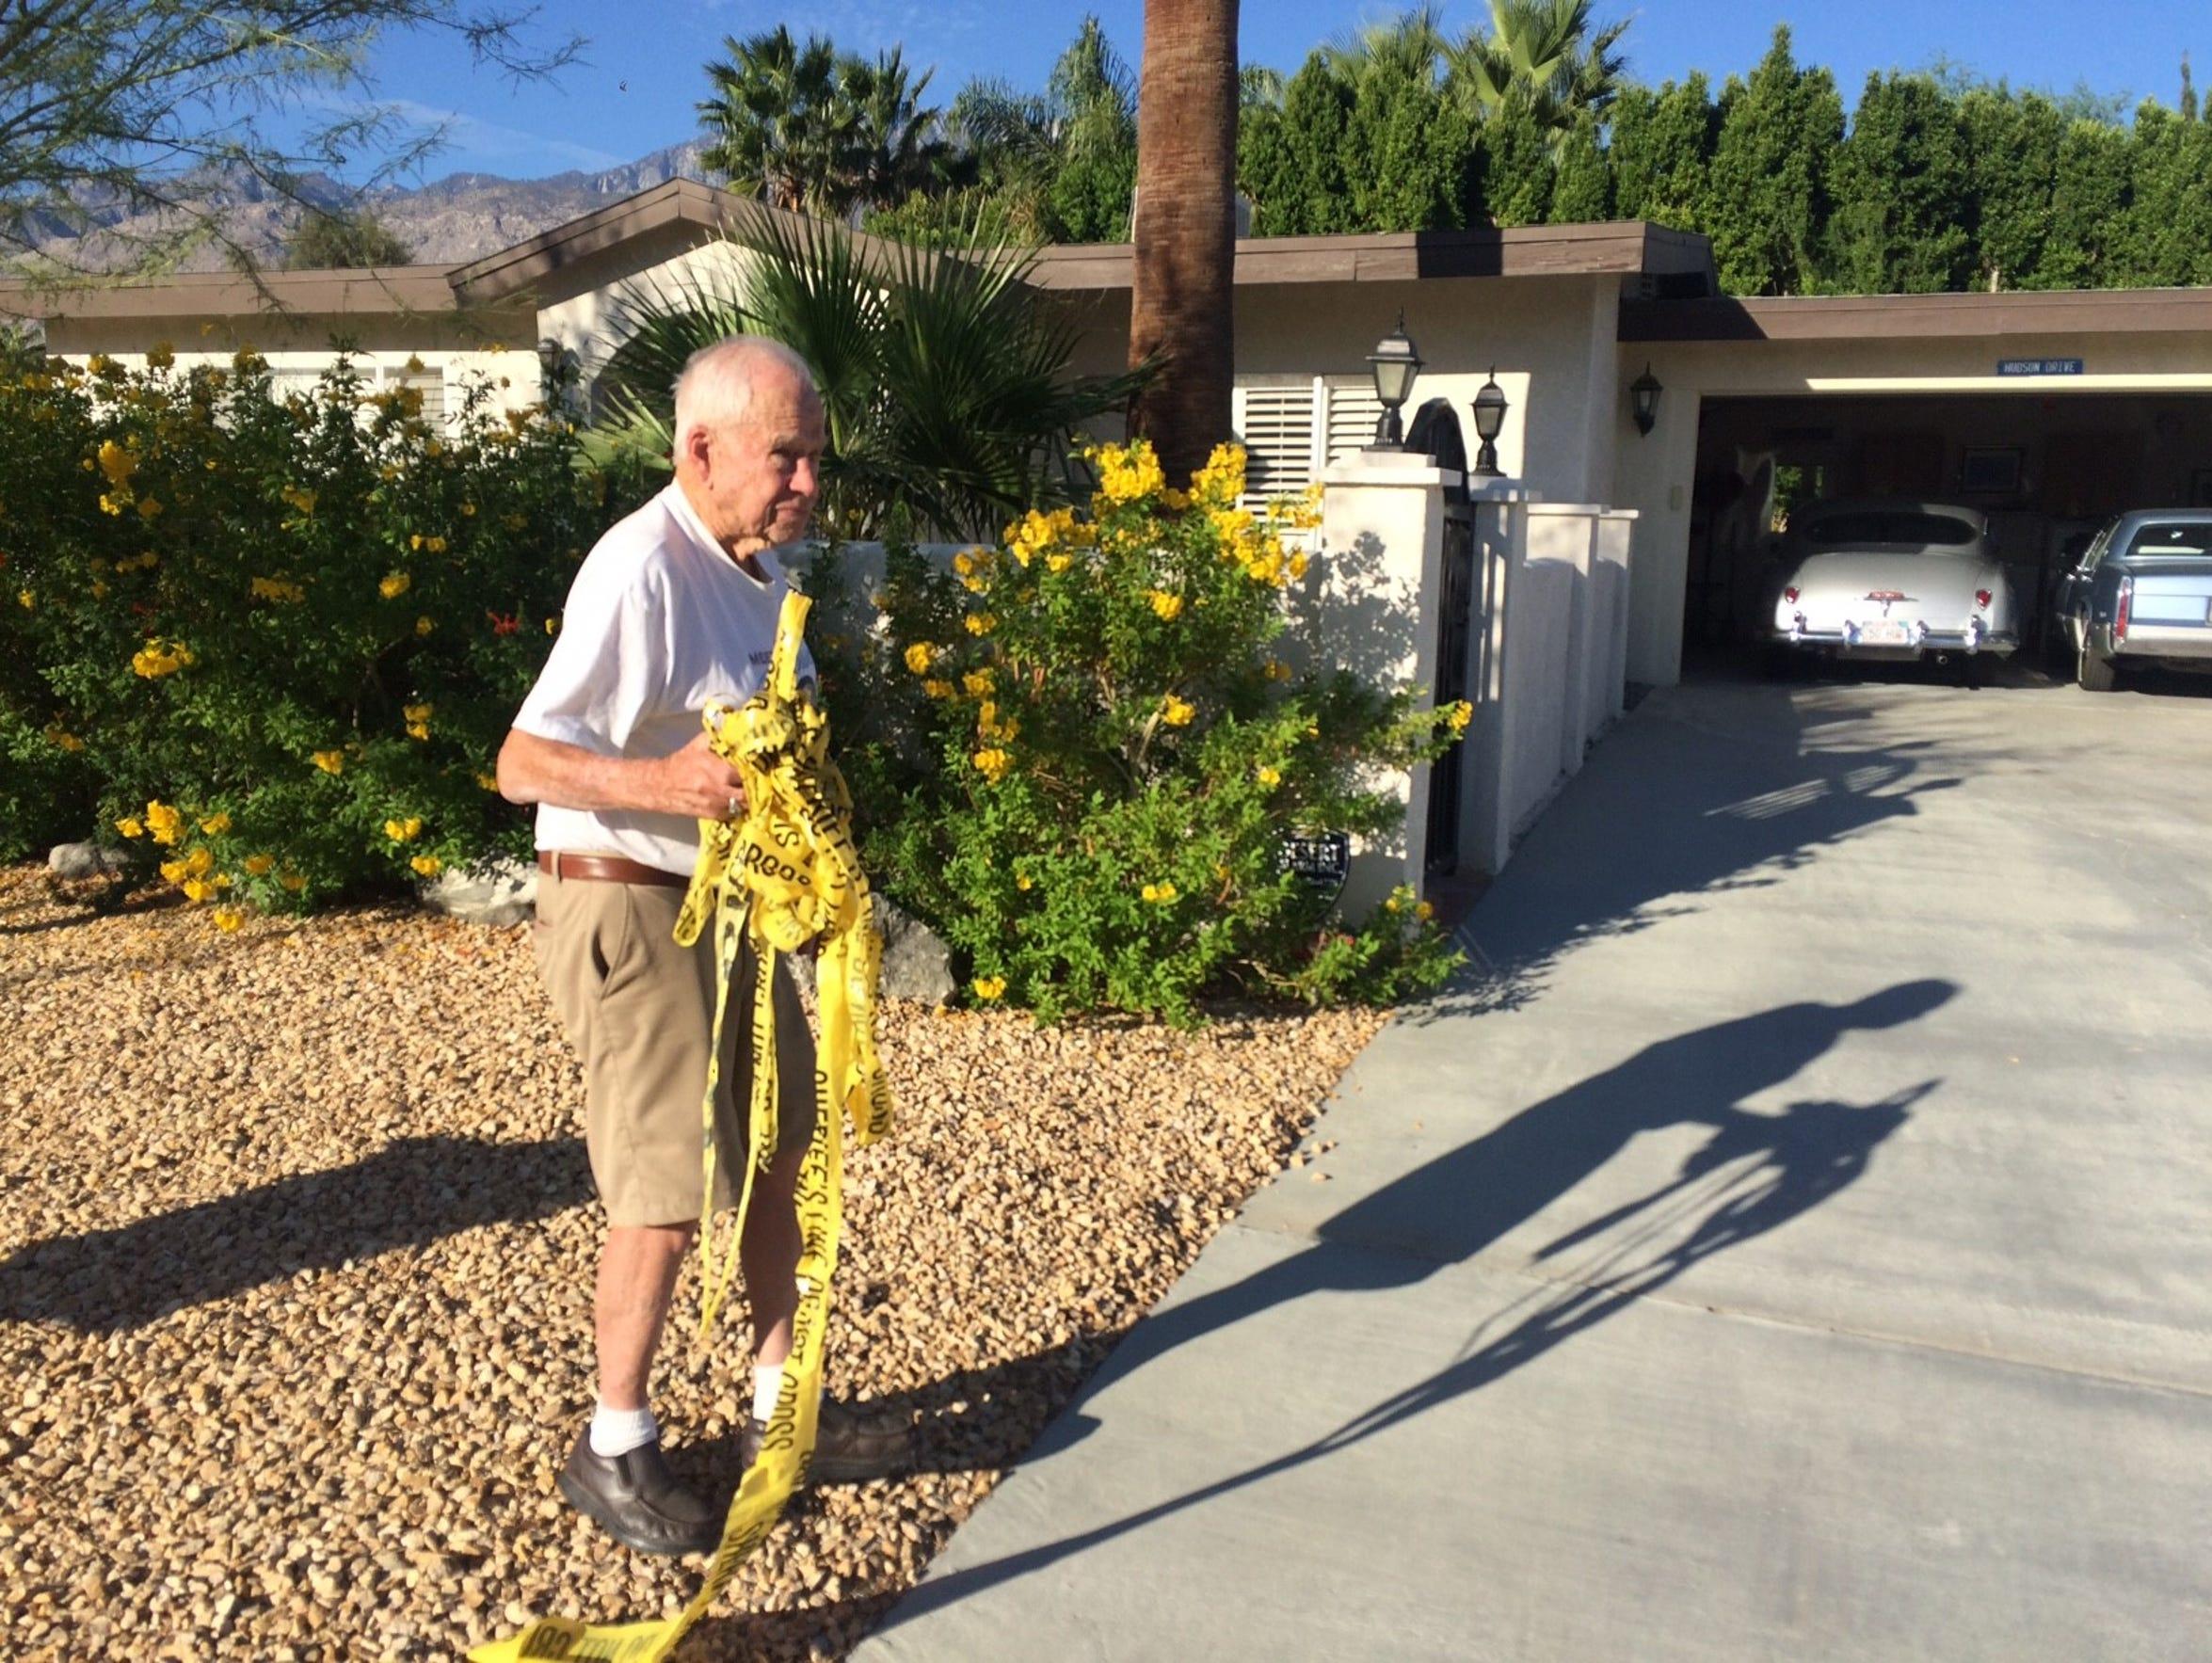 Fred Elg, 93, picks up handfuls of police tape left